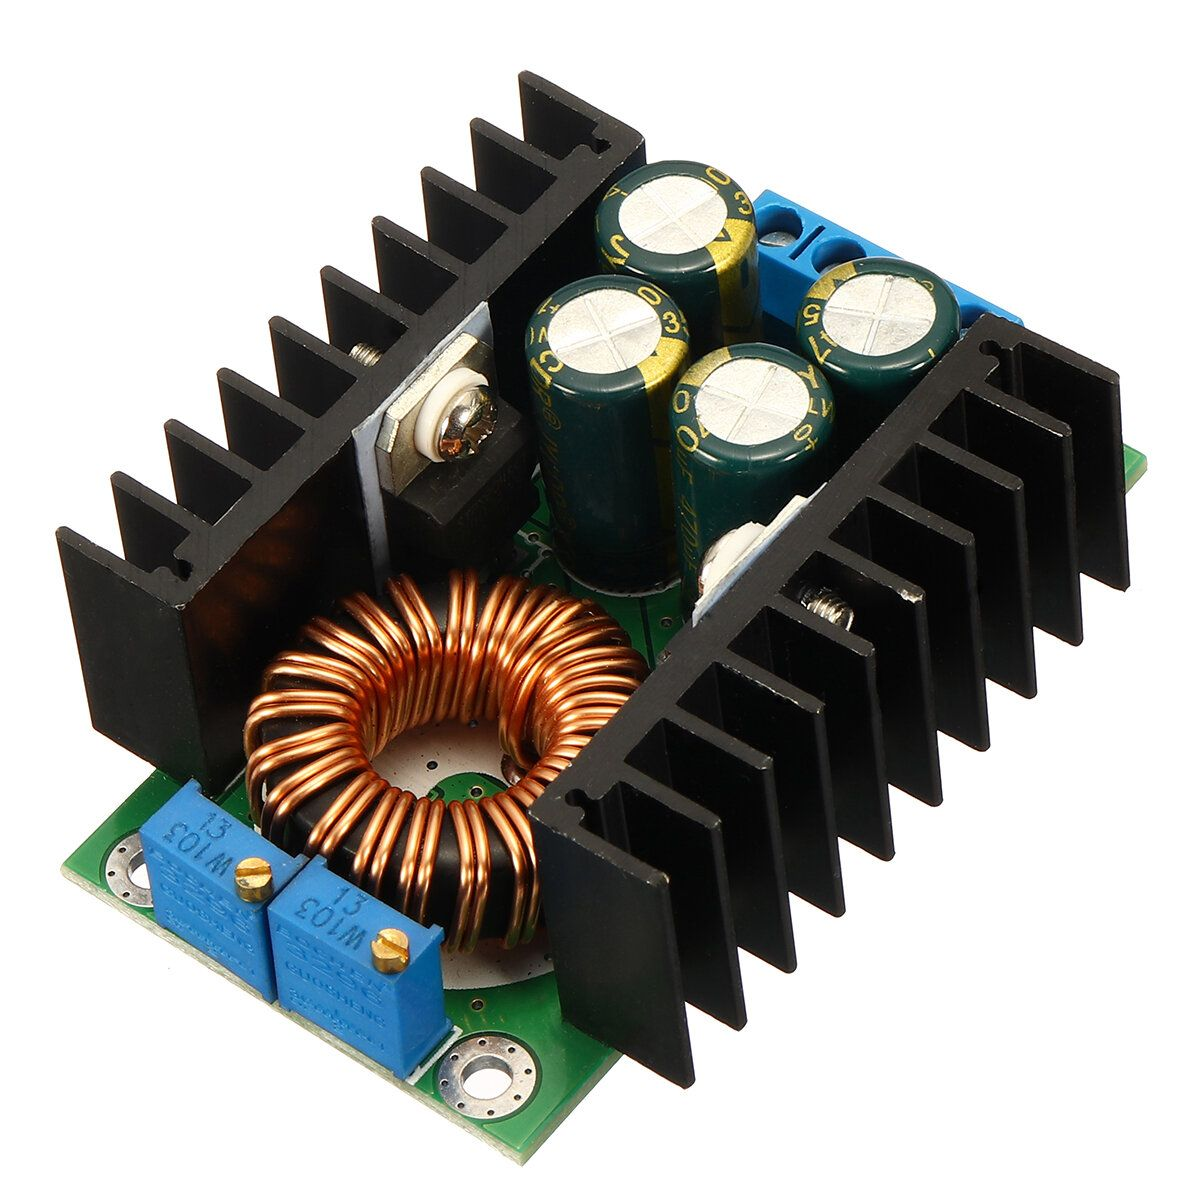 XFW US$3.99 DC-DC CC CV Buck Converter Board Step Down Power Supply Module 7-32V to 0.8-28V 12A